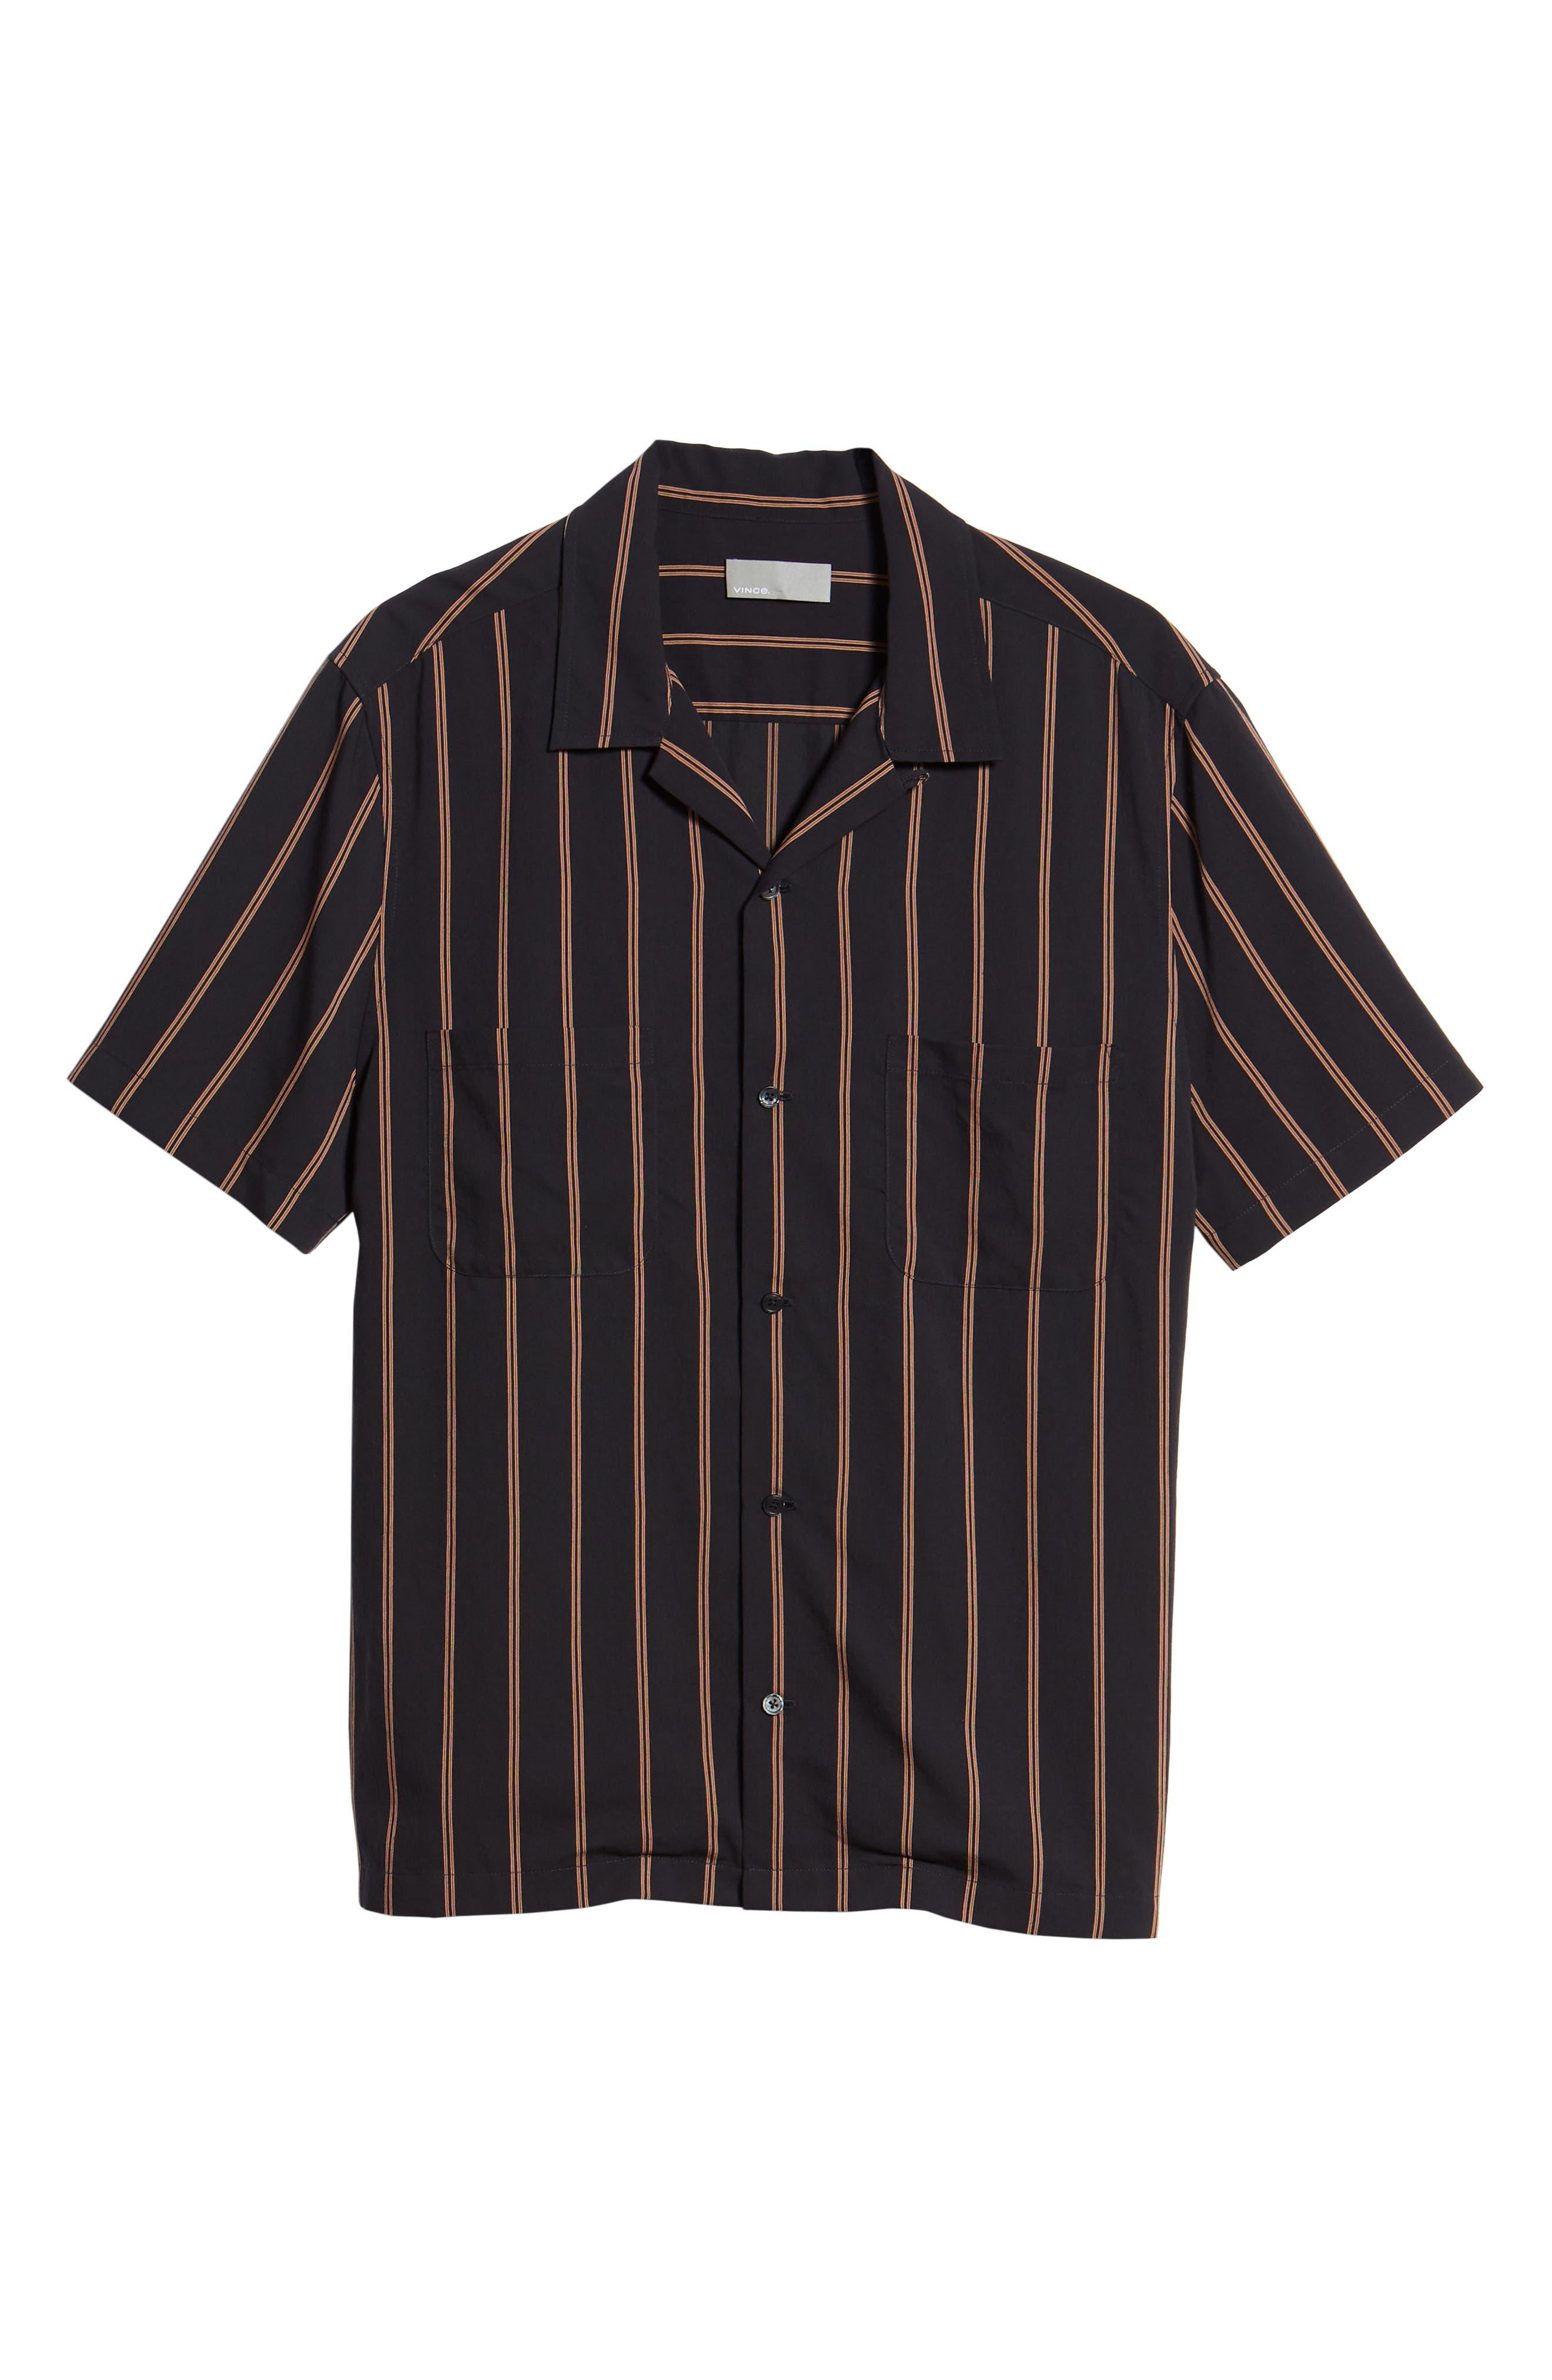 VINCE,                             Classic Vintage Cabana Shirt,                             Alternate thumbnail 6, color,                             463